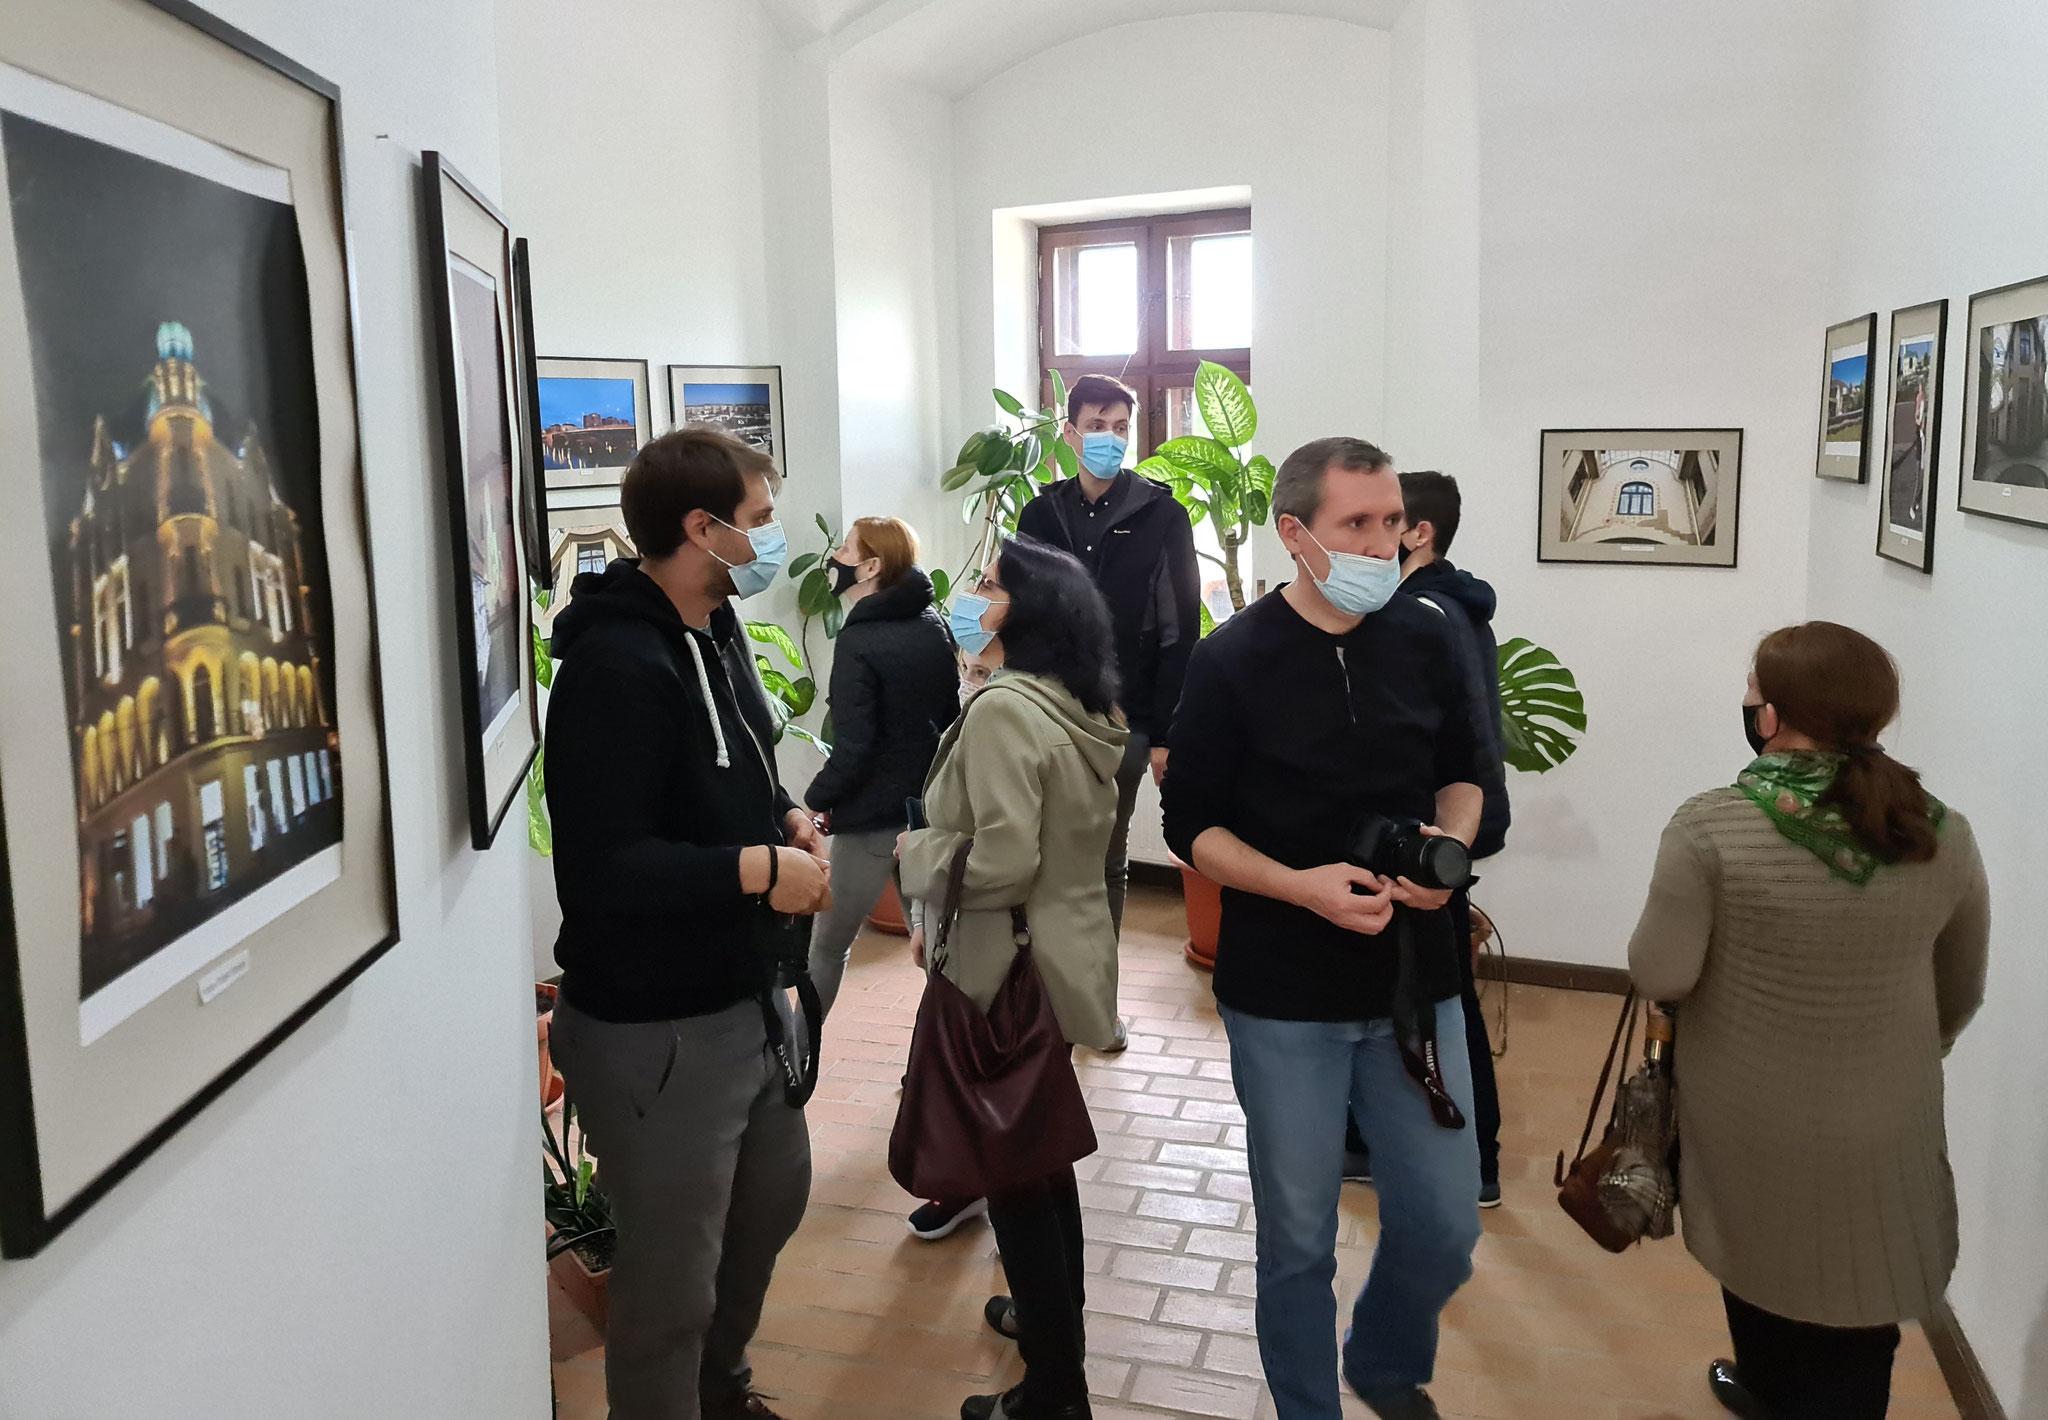 Foto: Tóth Magdolna